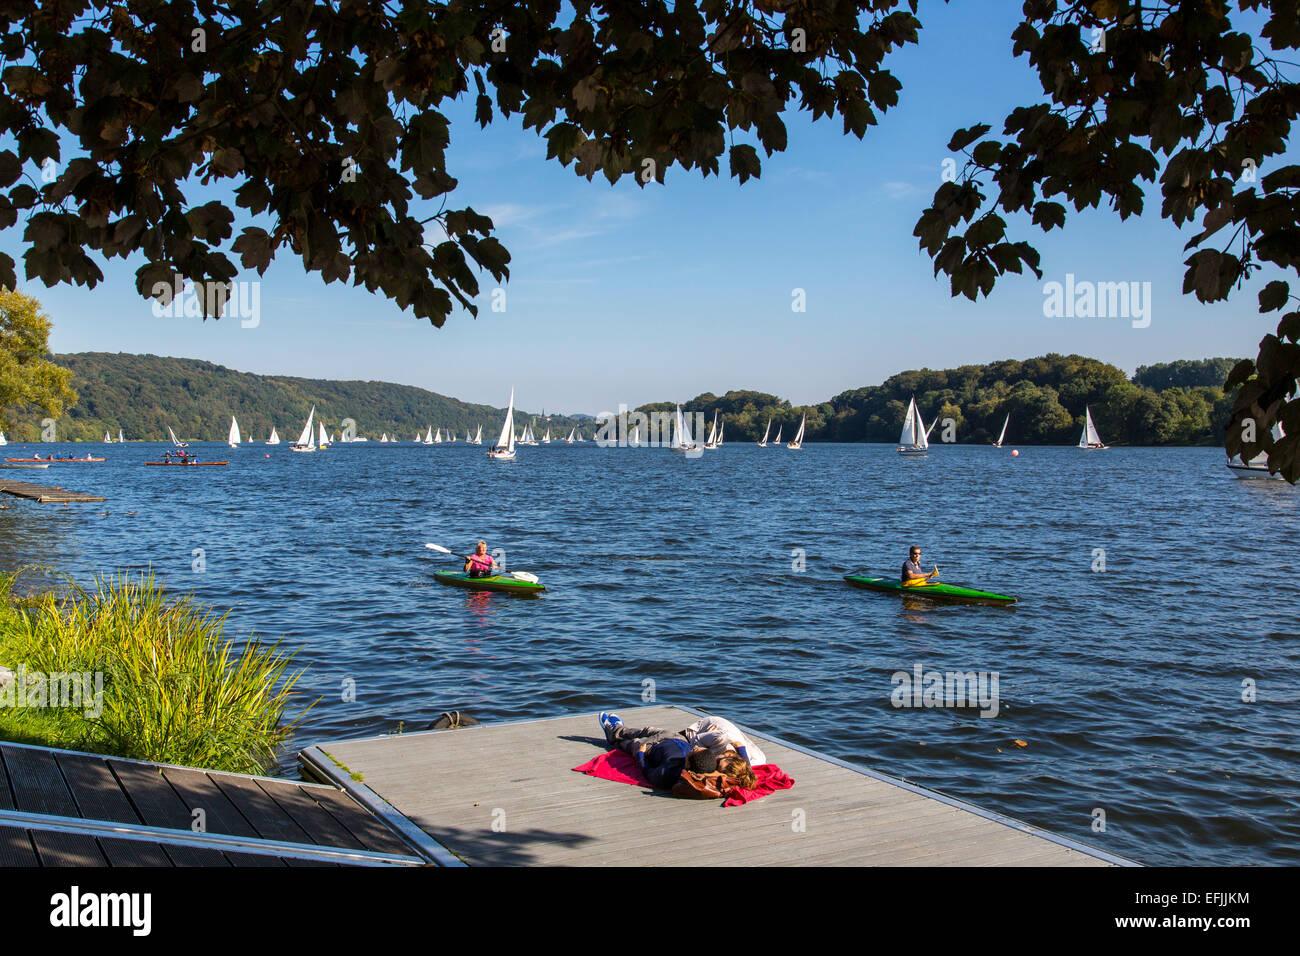 People enjoying summer, on a jetty, 'Baldeneysee' lake, river Ruhr, Essen, Germany, - Stock Image